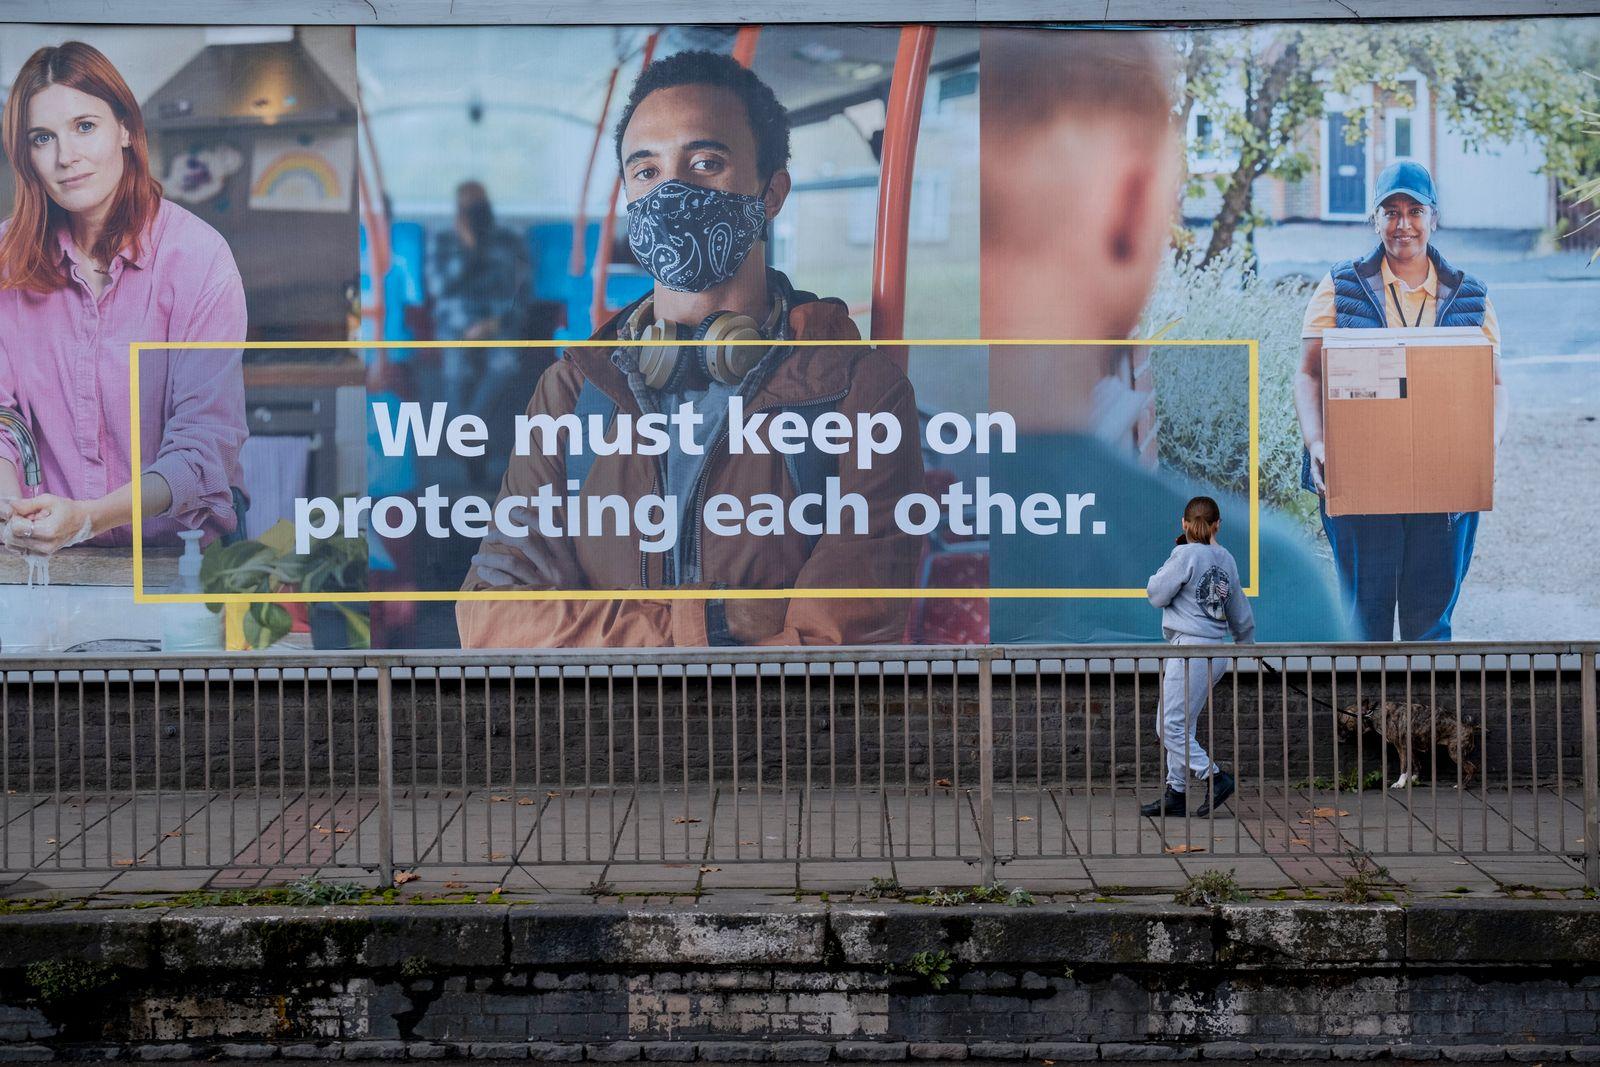 NHS Coronavirus Protection Billboard Ad